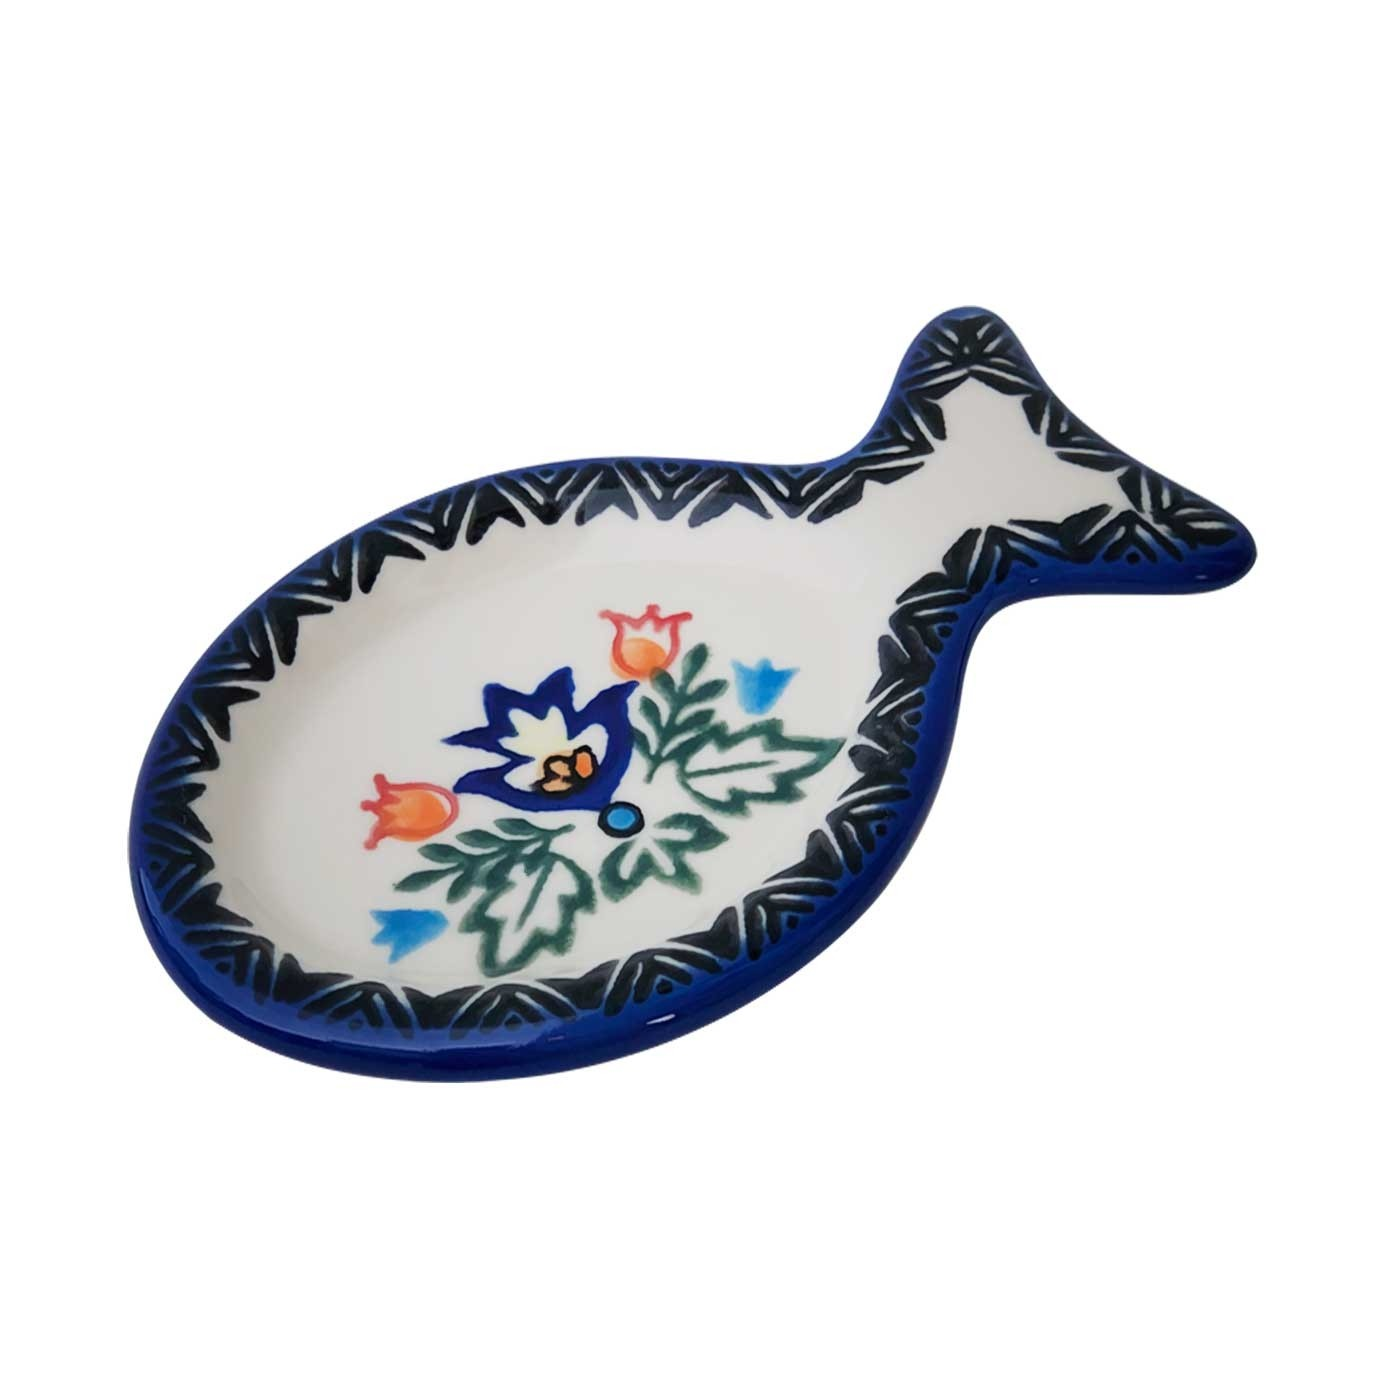 Pottery Avenue Stoneware Tea Caddy-Spoon Rest - V441-U289 SIMPLE FOLK